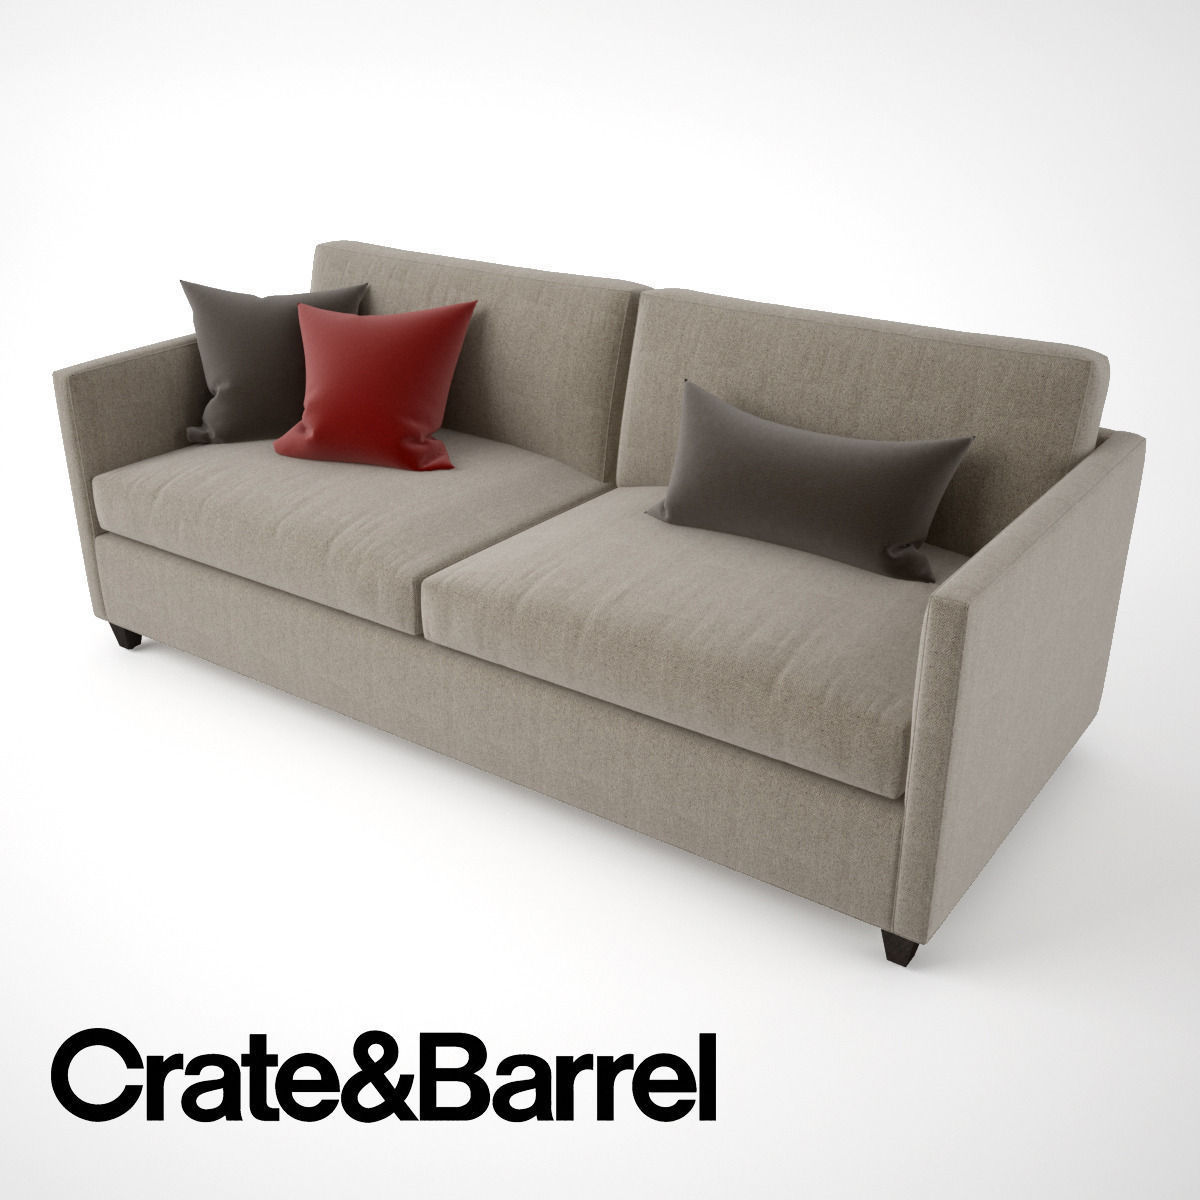 3d Crate And Barrel Dryden Apartment Sofa Cgtrader